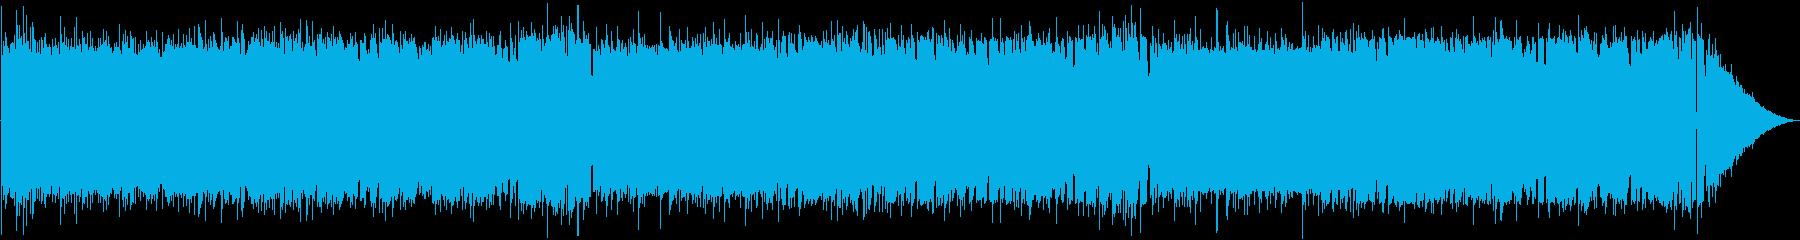 【8bit】ミラージュミステリアスバトルの再生済みの波形